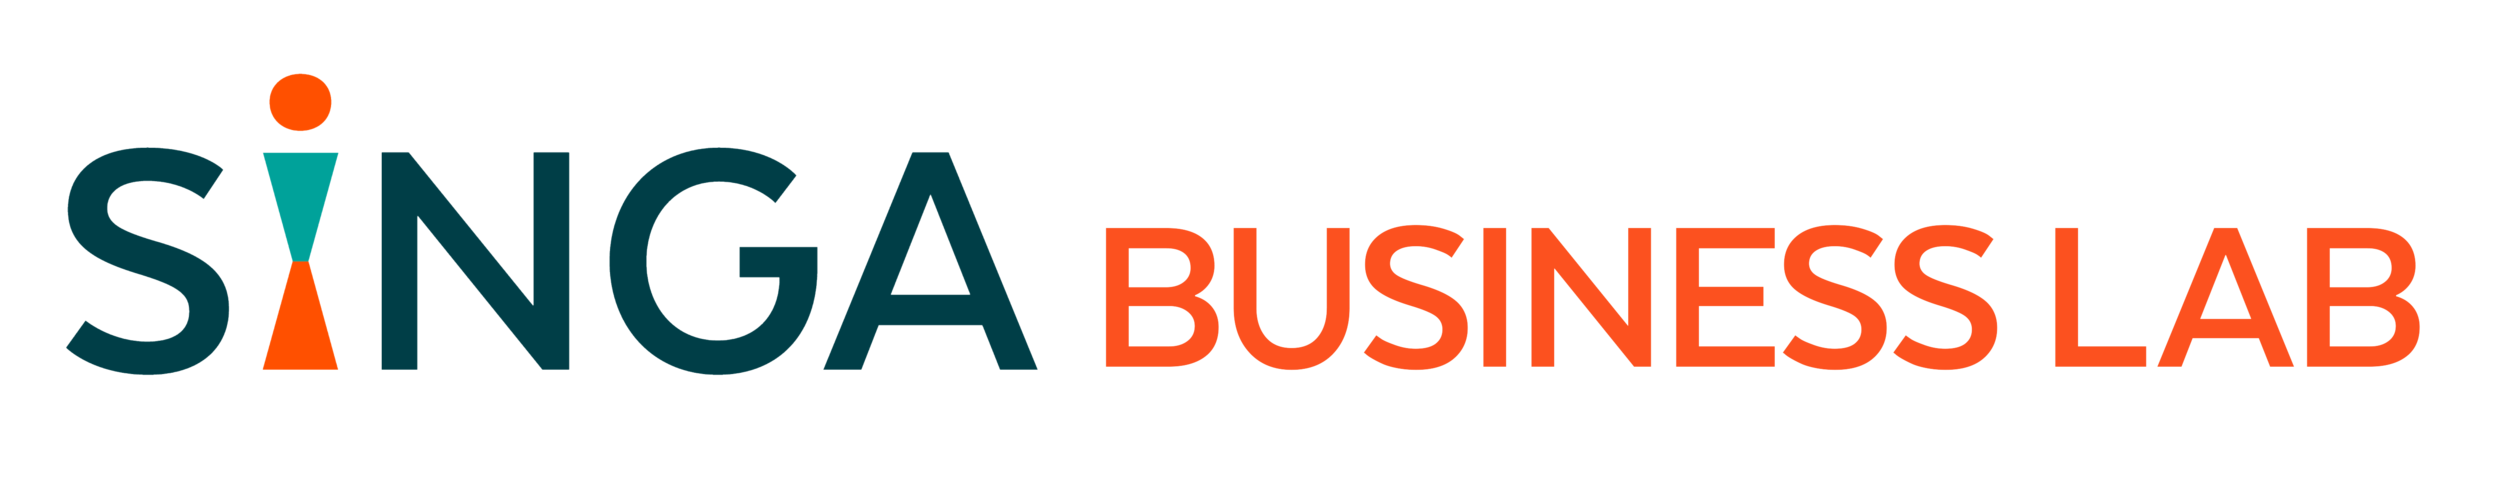 Kopie von Copy of SBL Logo 2018_clear background.png